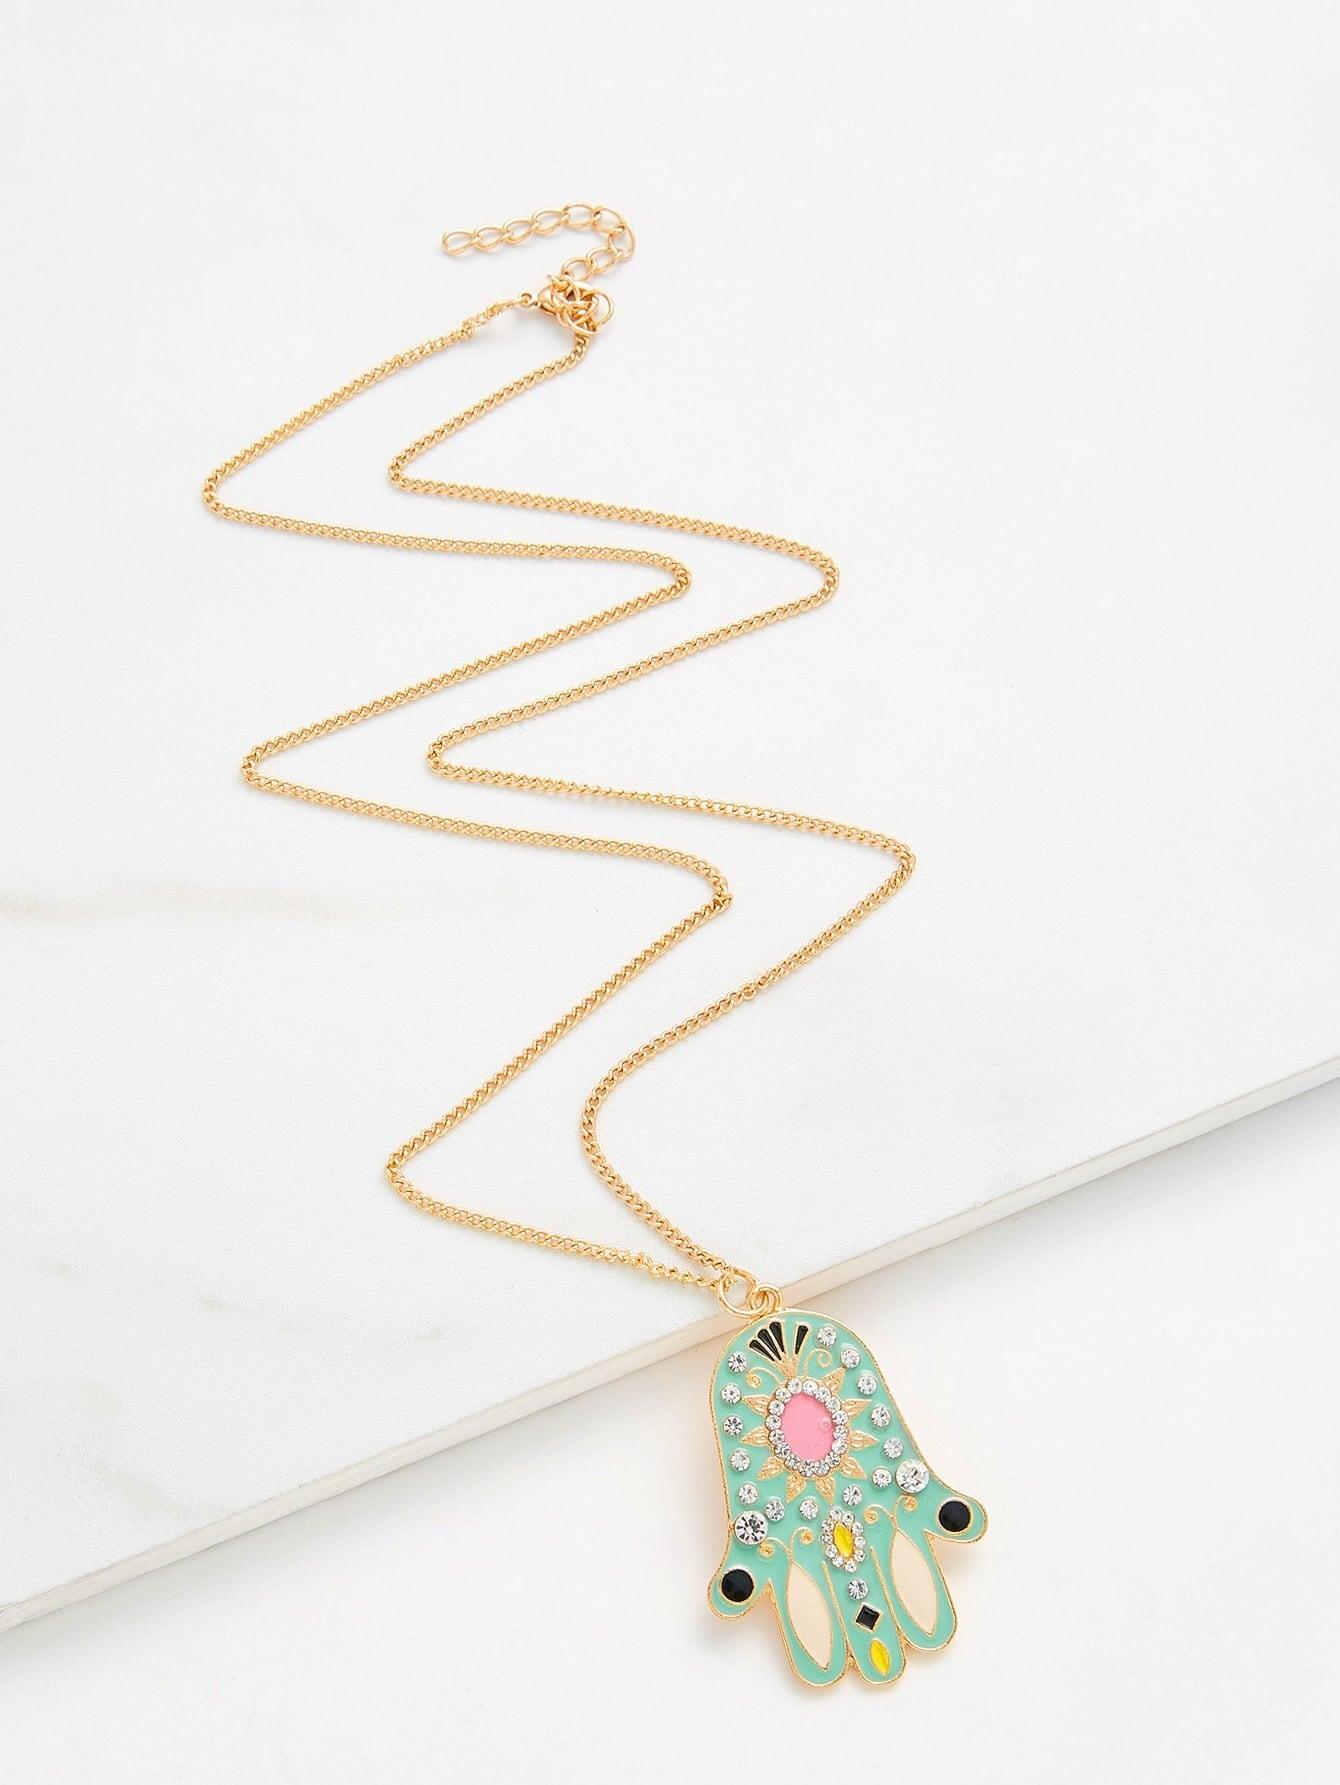 Rhinestone Palm Pendant Chain Necklace